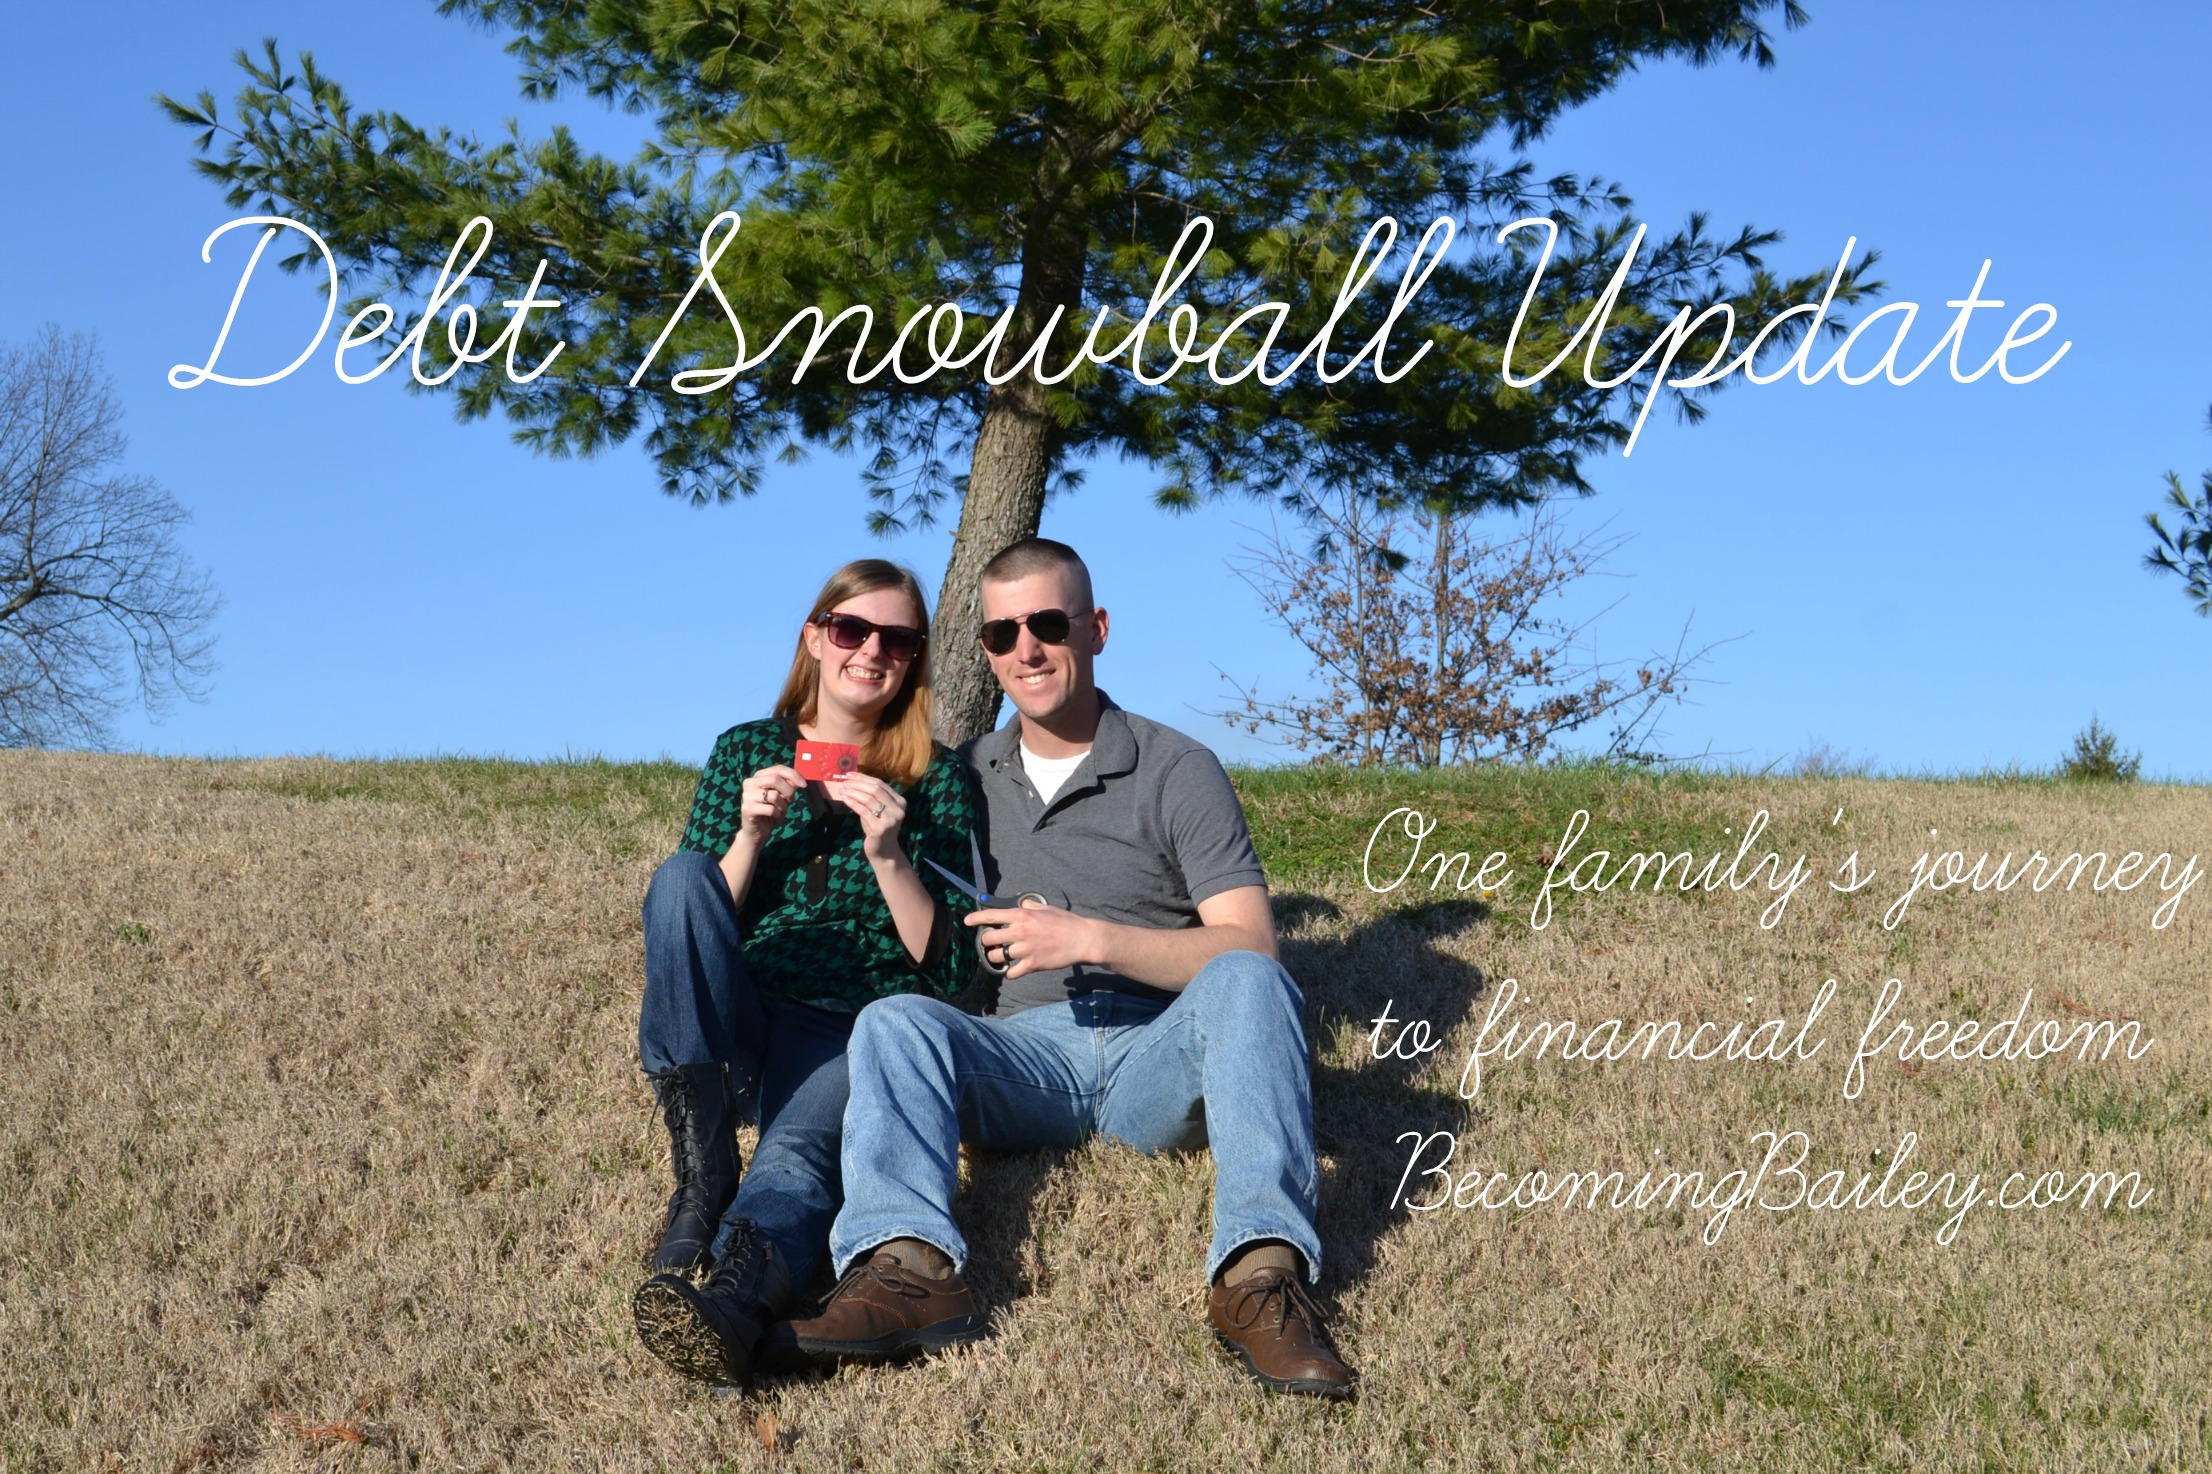 Debt Snowball Update: One Down, Three to Go!